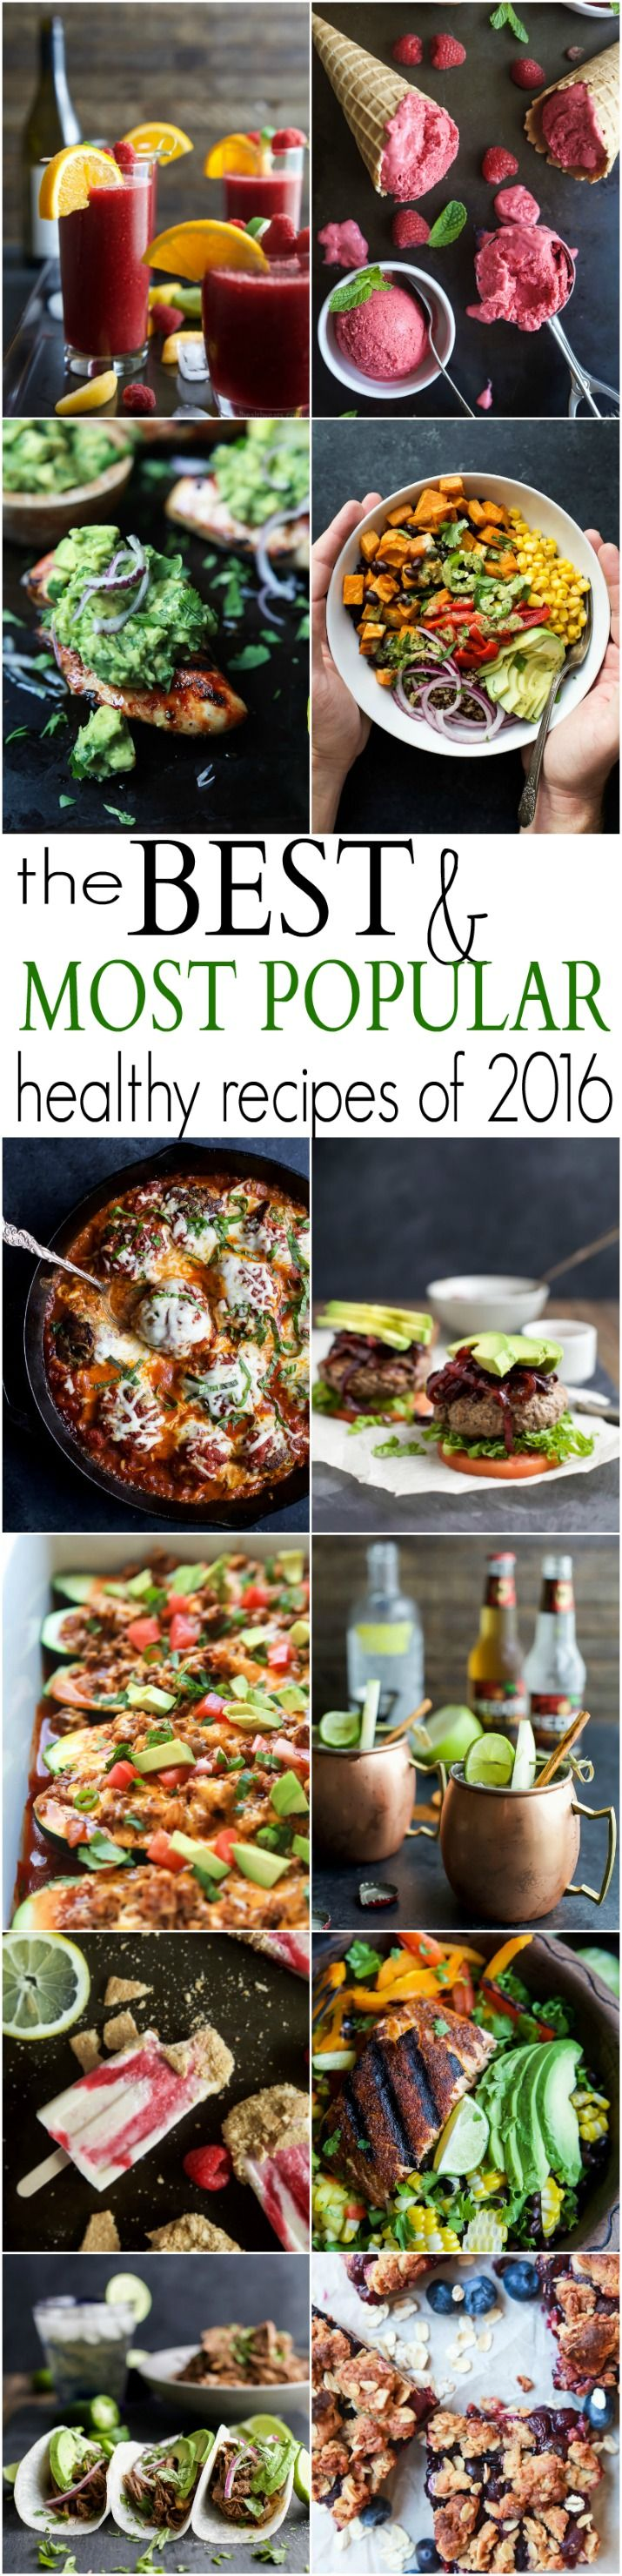 The BEST & Most Popular Recipes of 2016 | joyfulhealthyeats... | Dinner Ideas | Family Recipes | Kid Friendly | Breakfast Recipes | Dessert | Cocktail | 30 Minute Meals